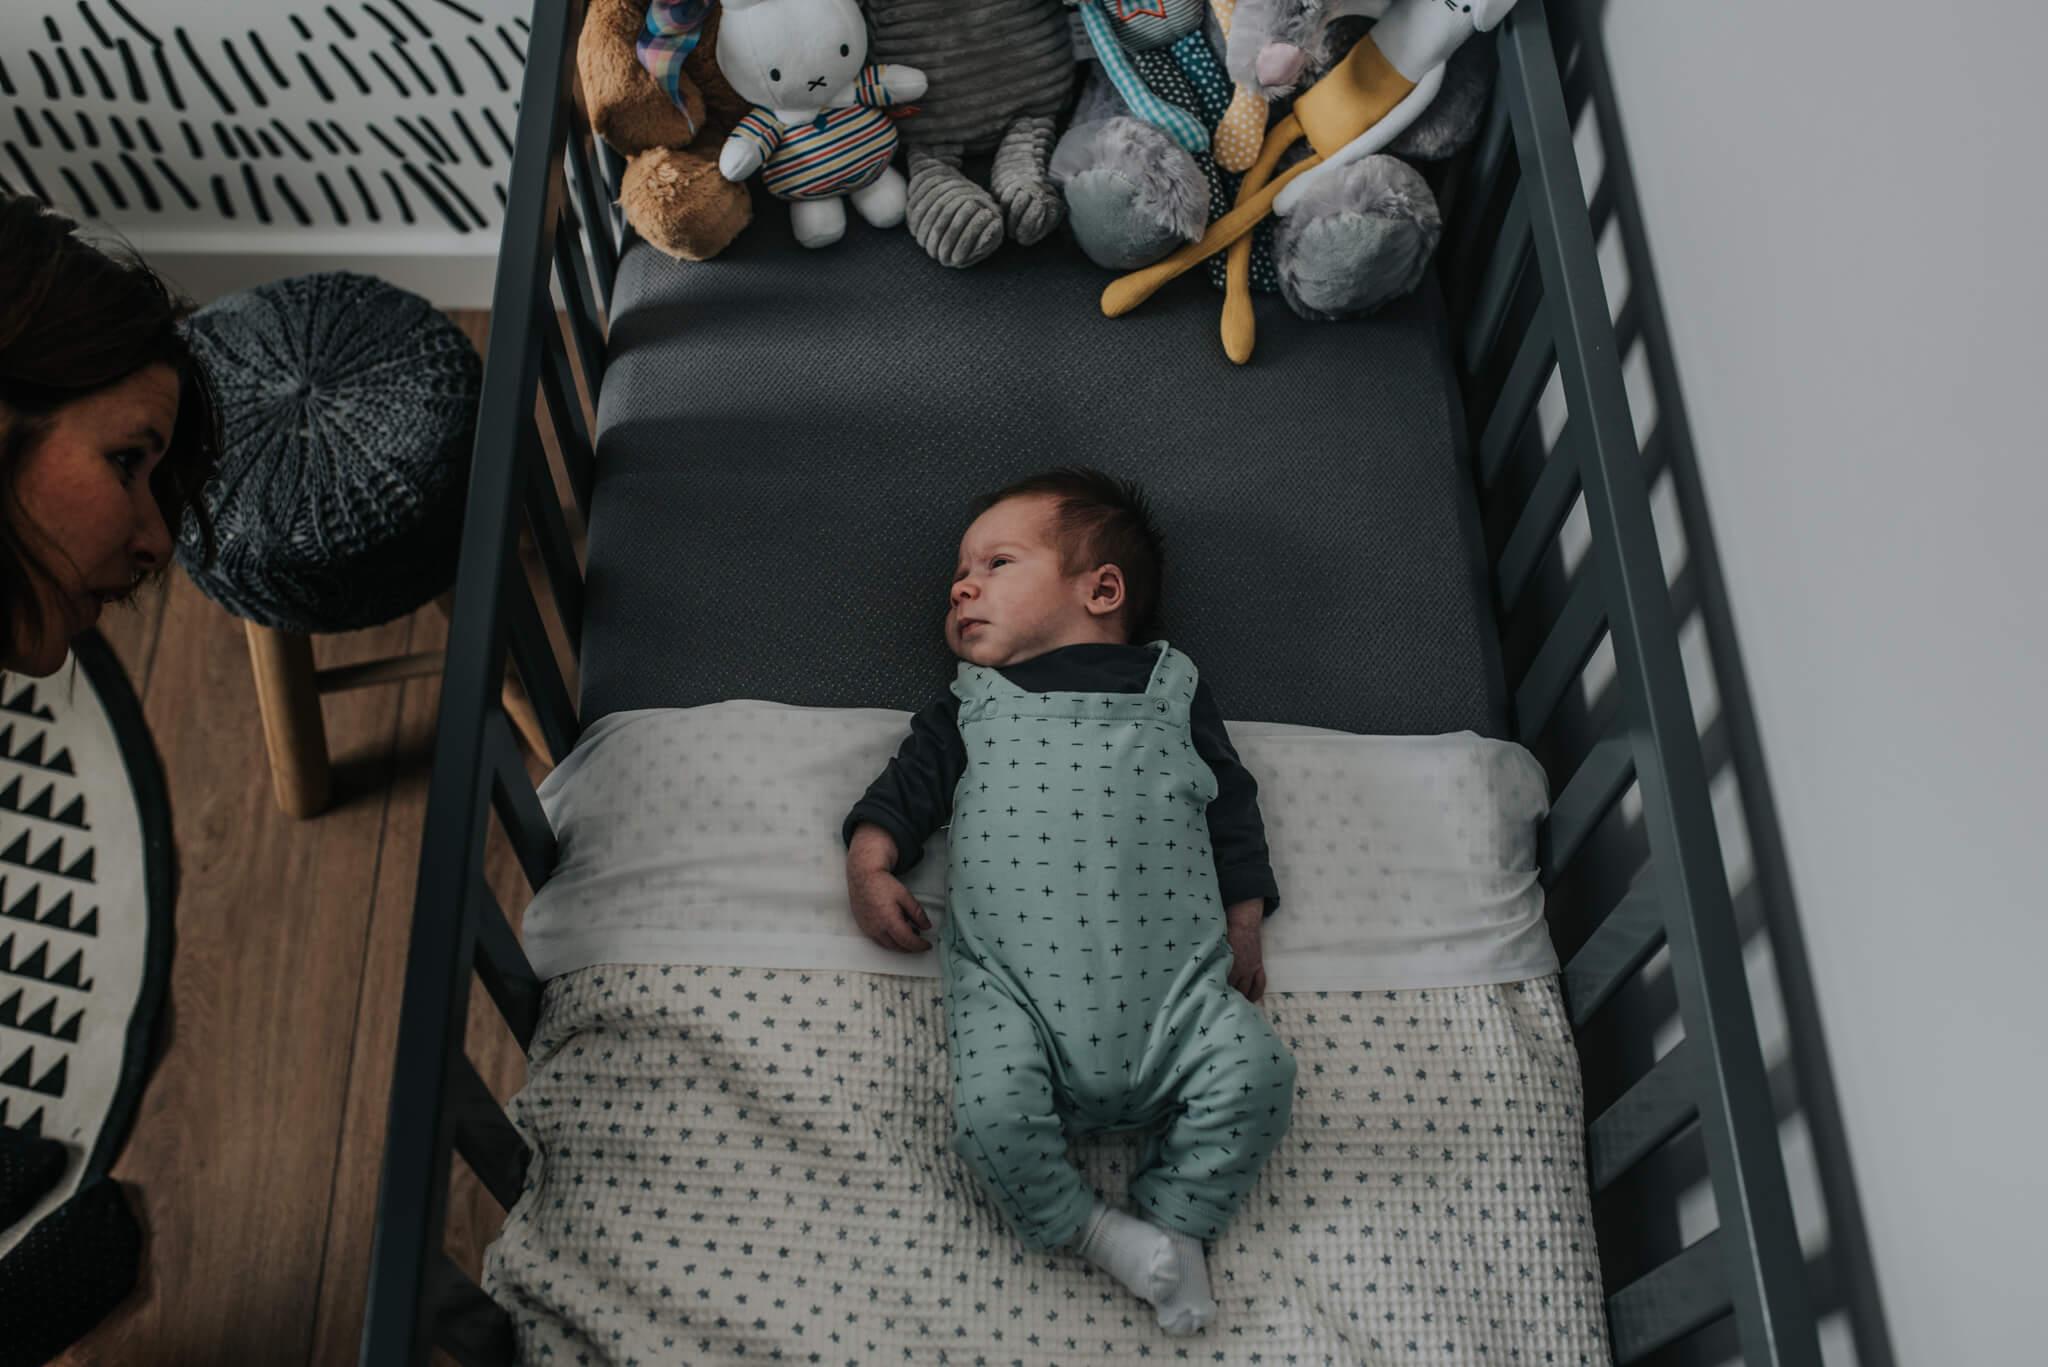 newborn lifestyle fotografienewborn lifestyle fotografie